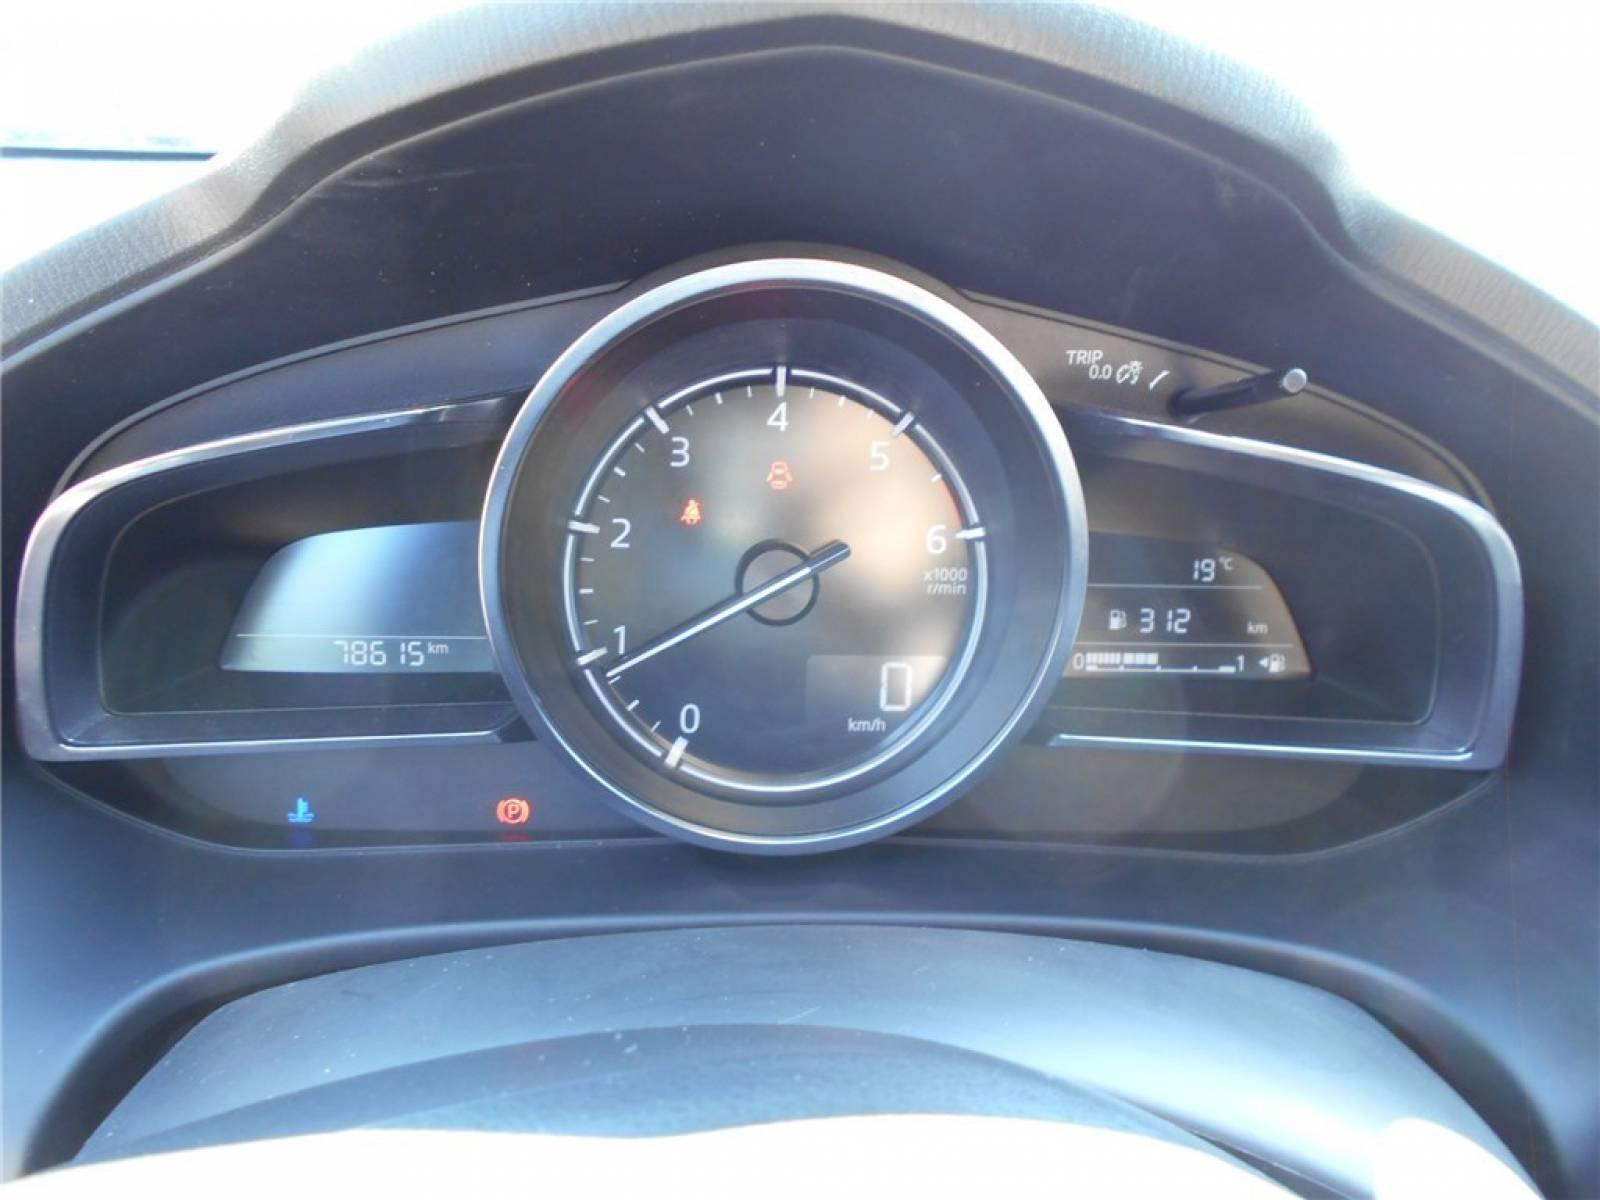 MAZDA Mazda3 2.2L SKYACTIV-D 150ch - véhicule d'occasion - Groupe Guillet - Chalon Automobiles - 71100 - Chalon-sur-Saône - 25